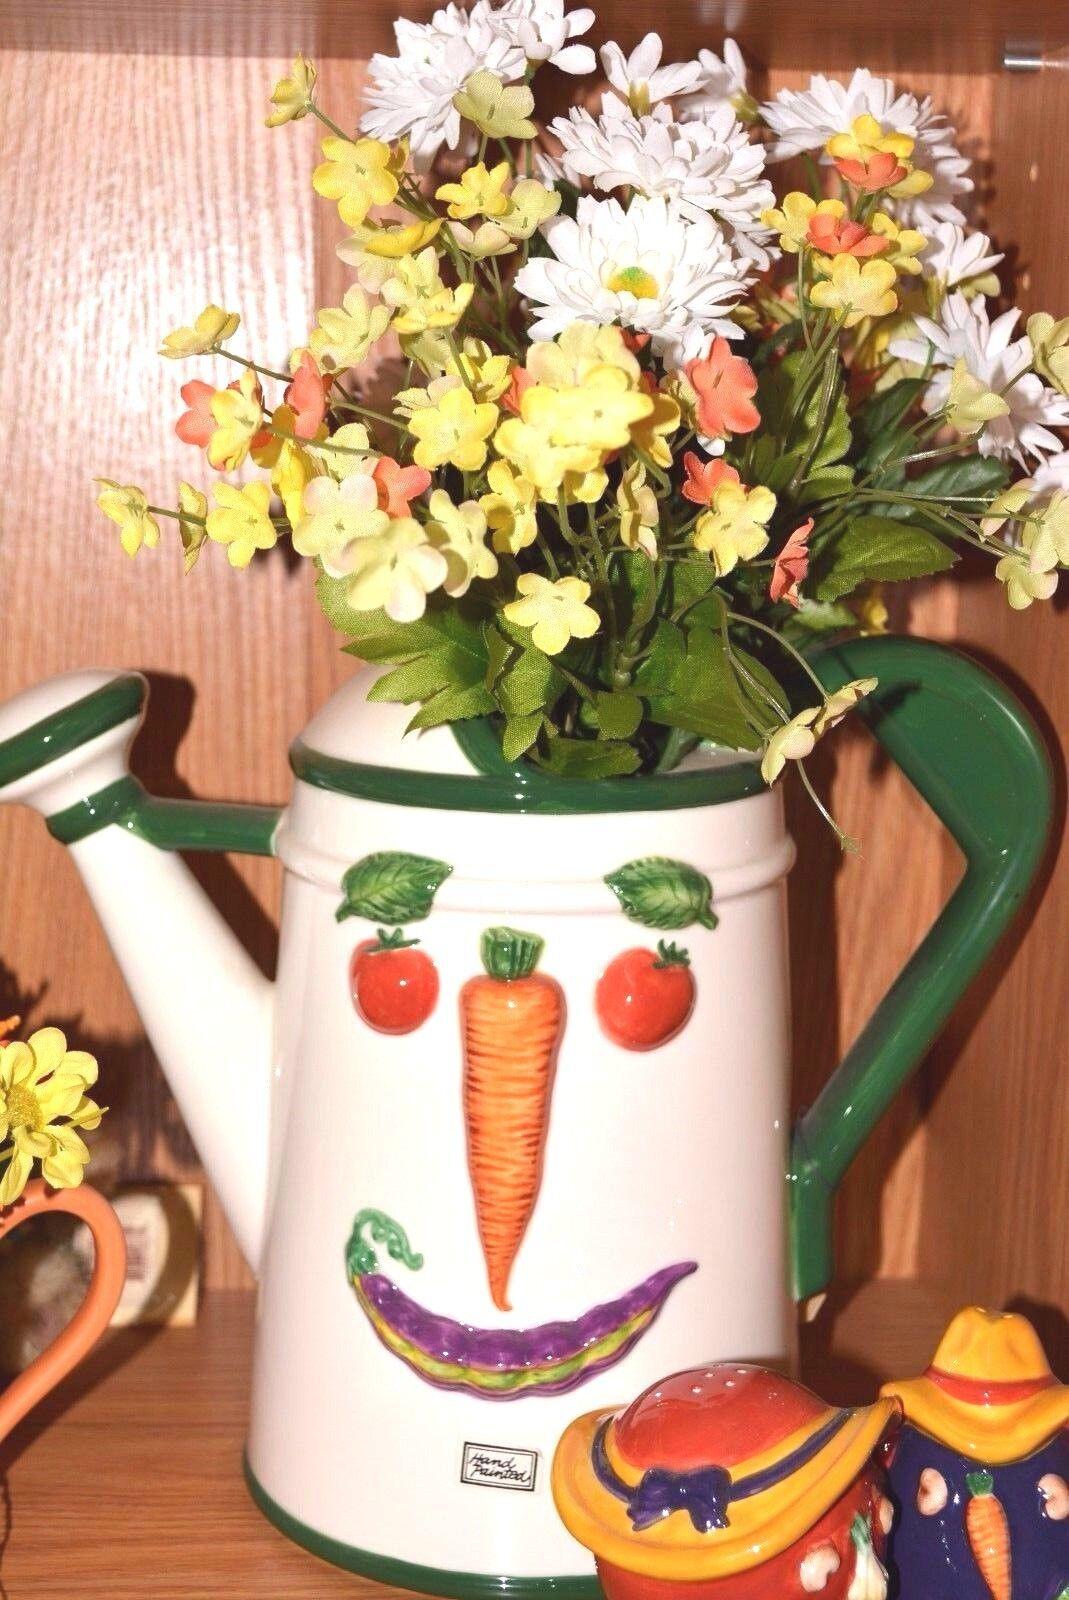 Department 56 32416 Watering GARDEN Can CERAMIC PITCHER Vegetable Healthy NEW